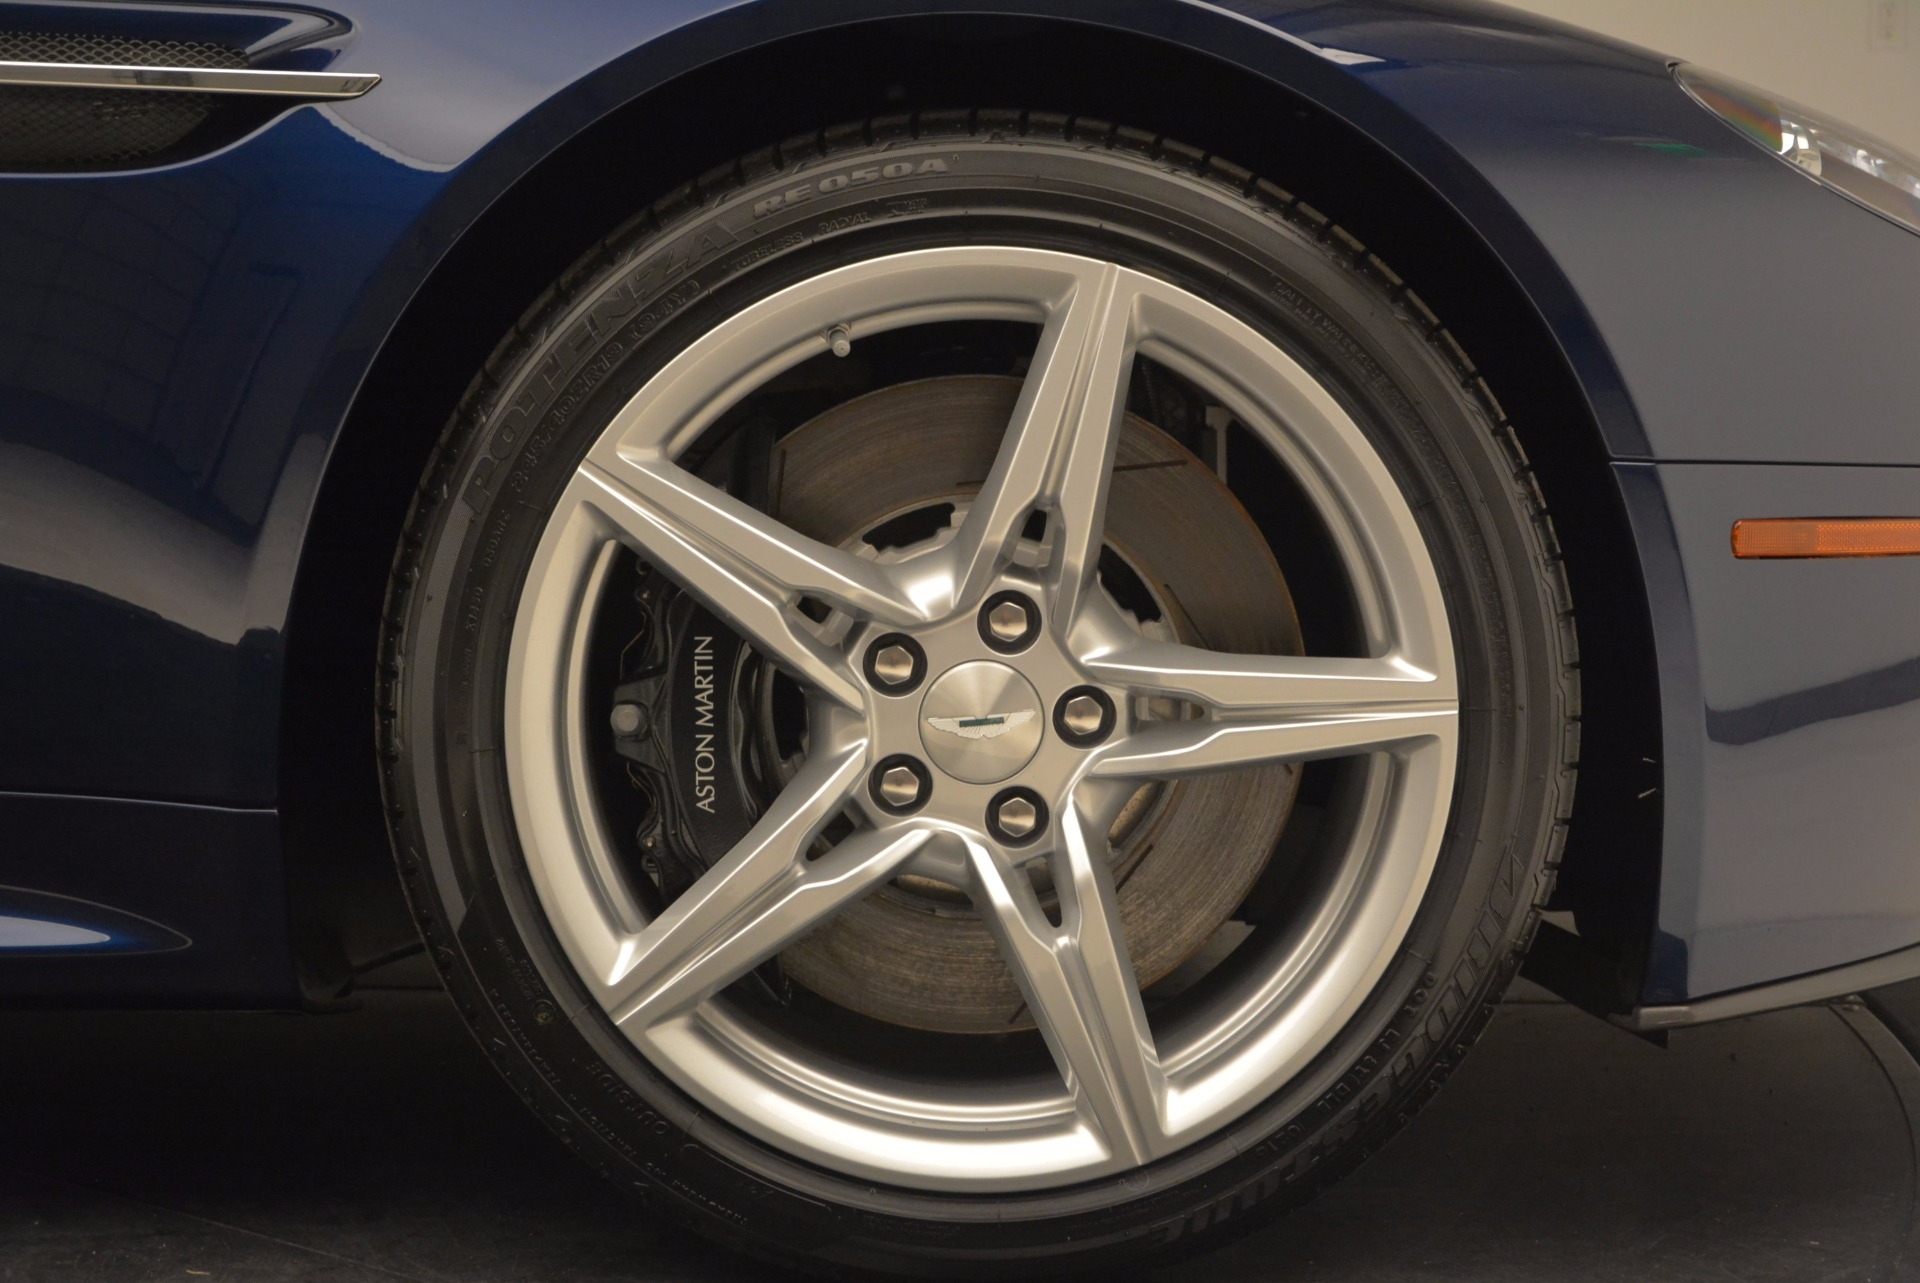 New-2016-Aston-Martin-V8-Vantage